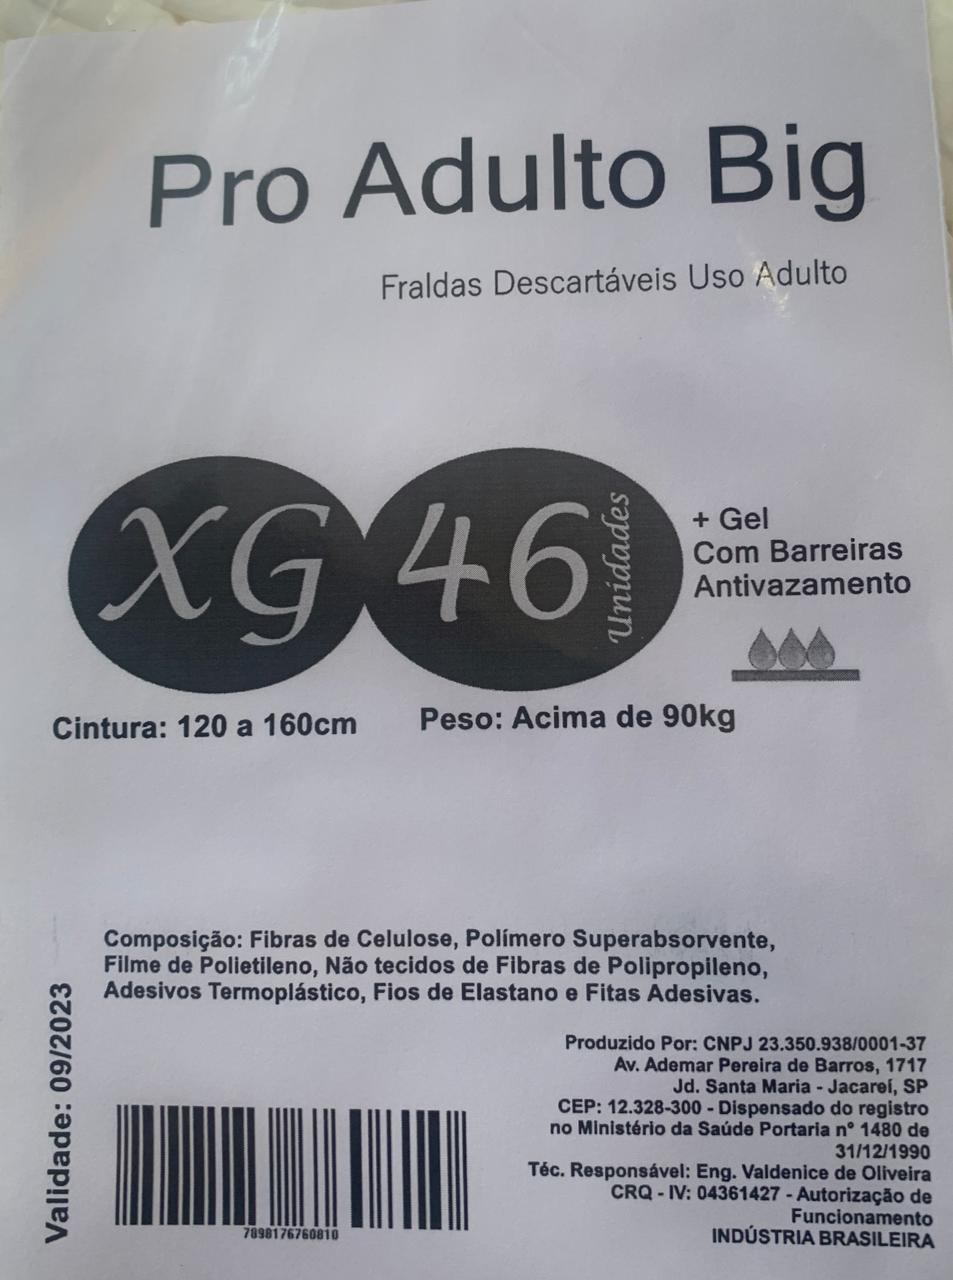 Fralda Geriátrica Pro adult big tam XG com 46 unidades